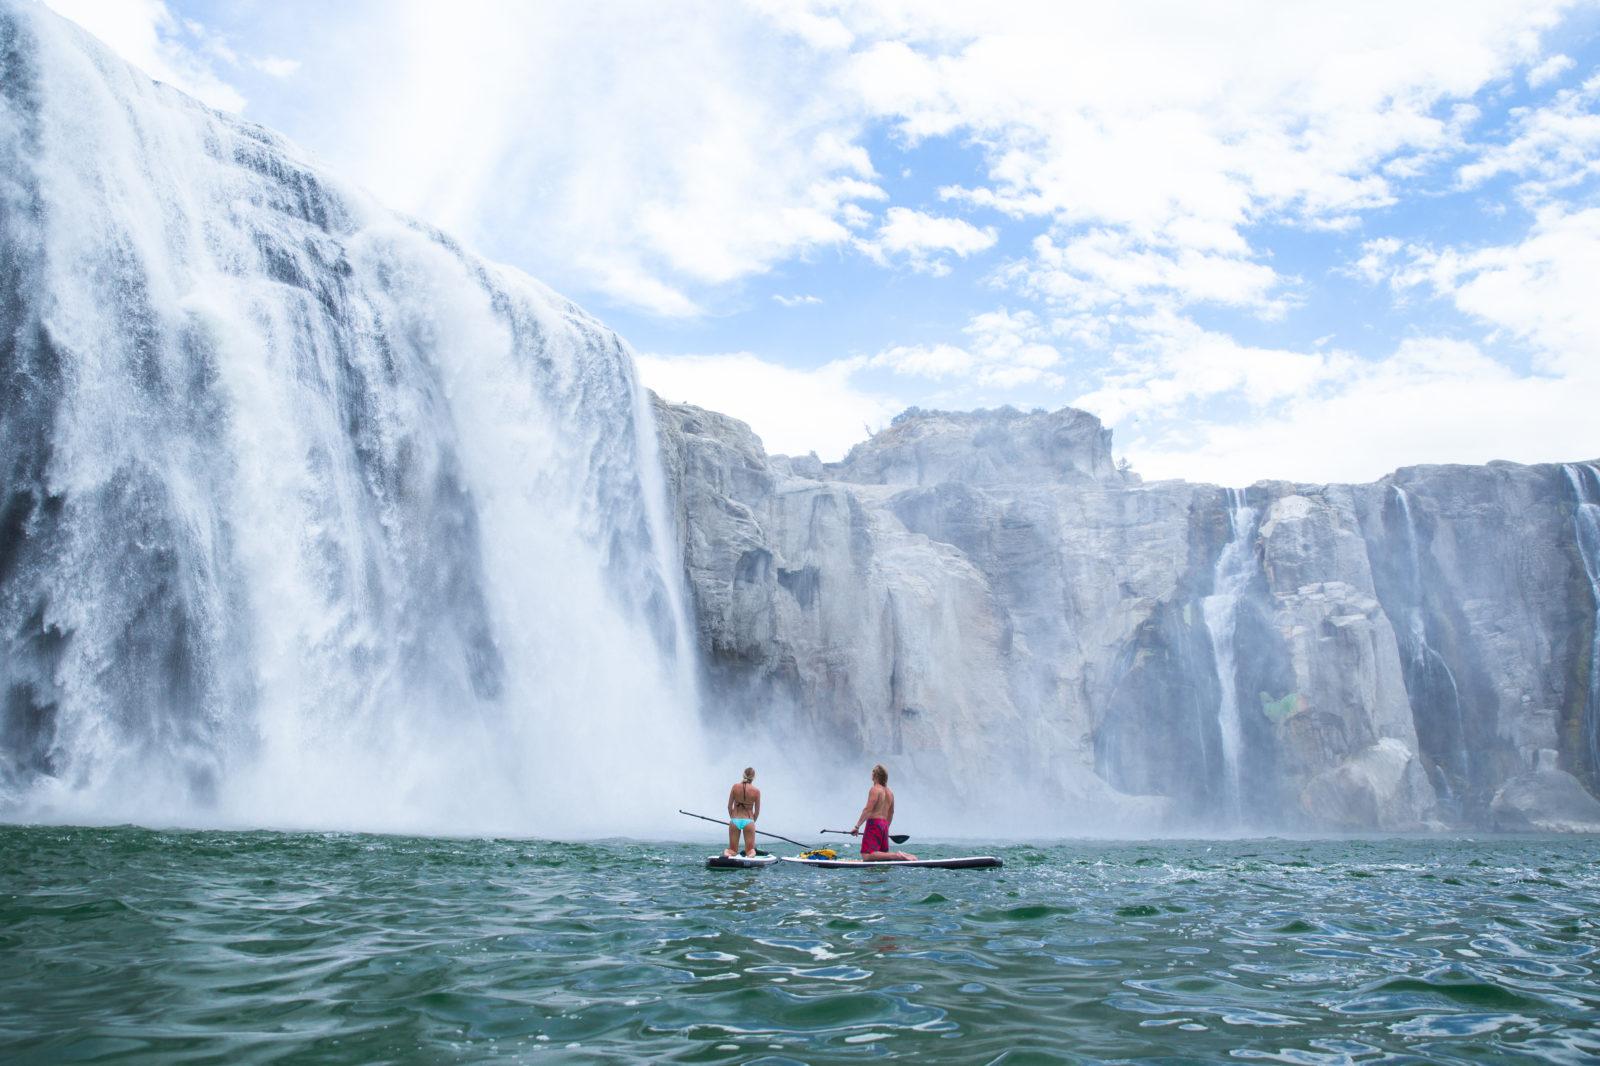 Discover Idaho's Top 5 Secret Adventure Getaways